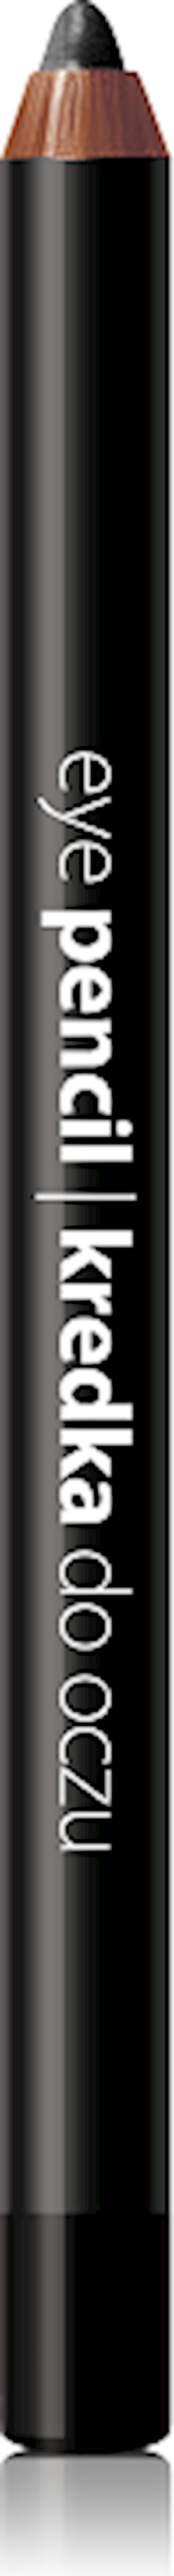 Göz qələmi Paese Eye Pencil 1 Jet Jet Black